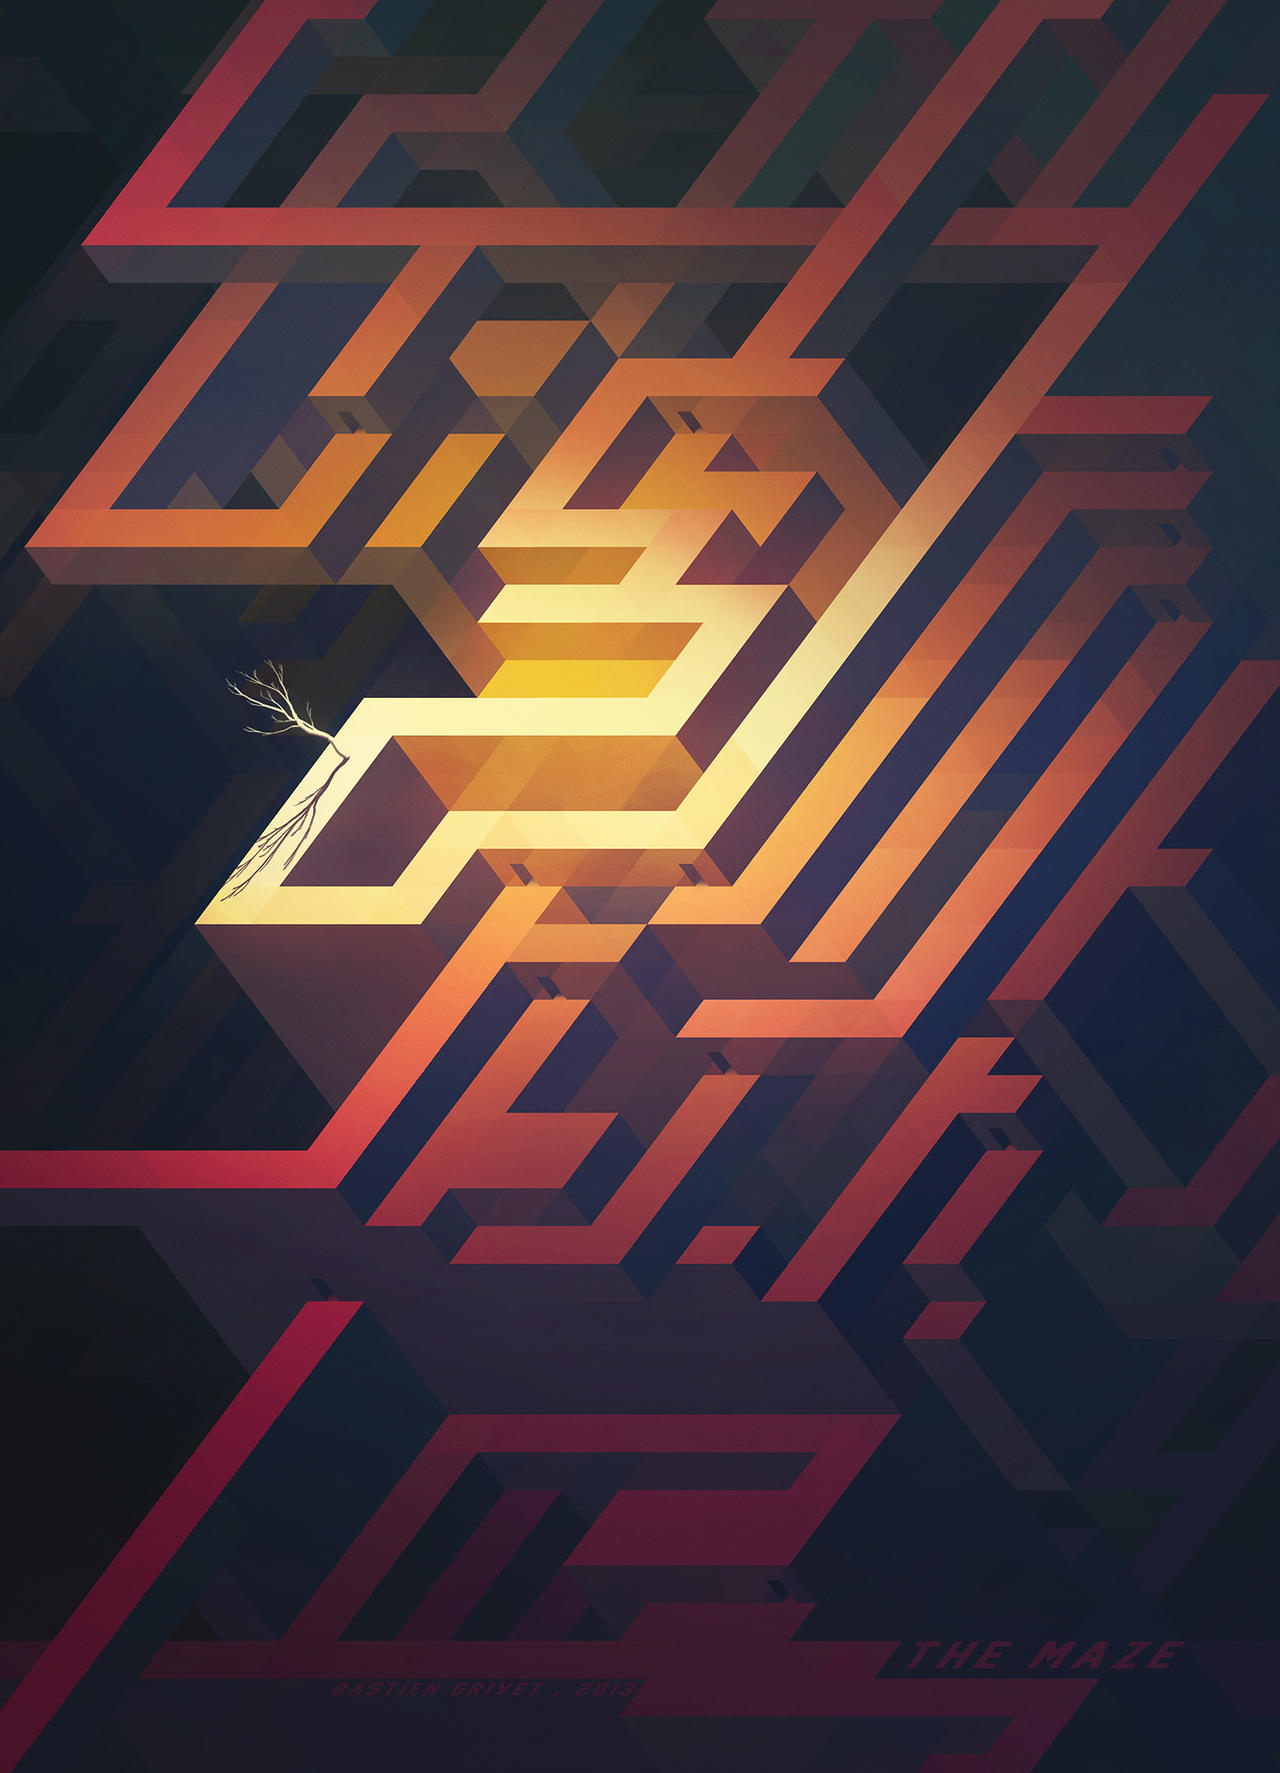 The Maze by Grivetart